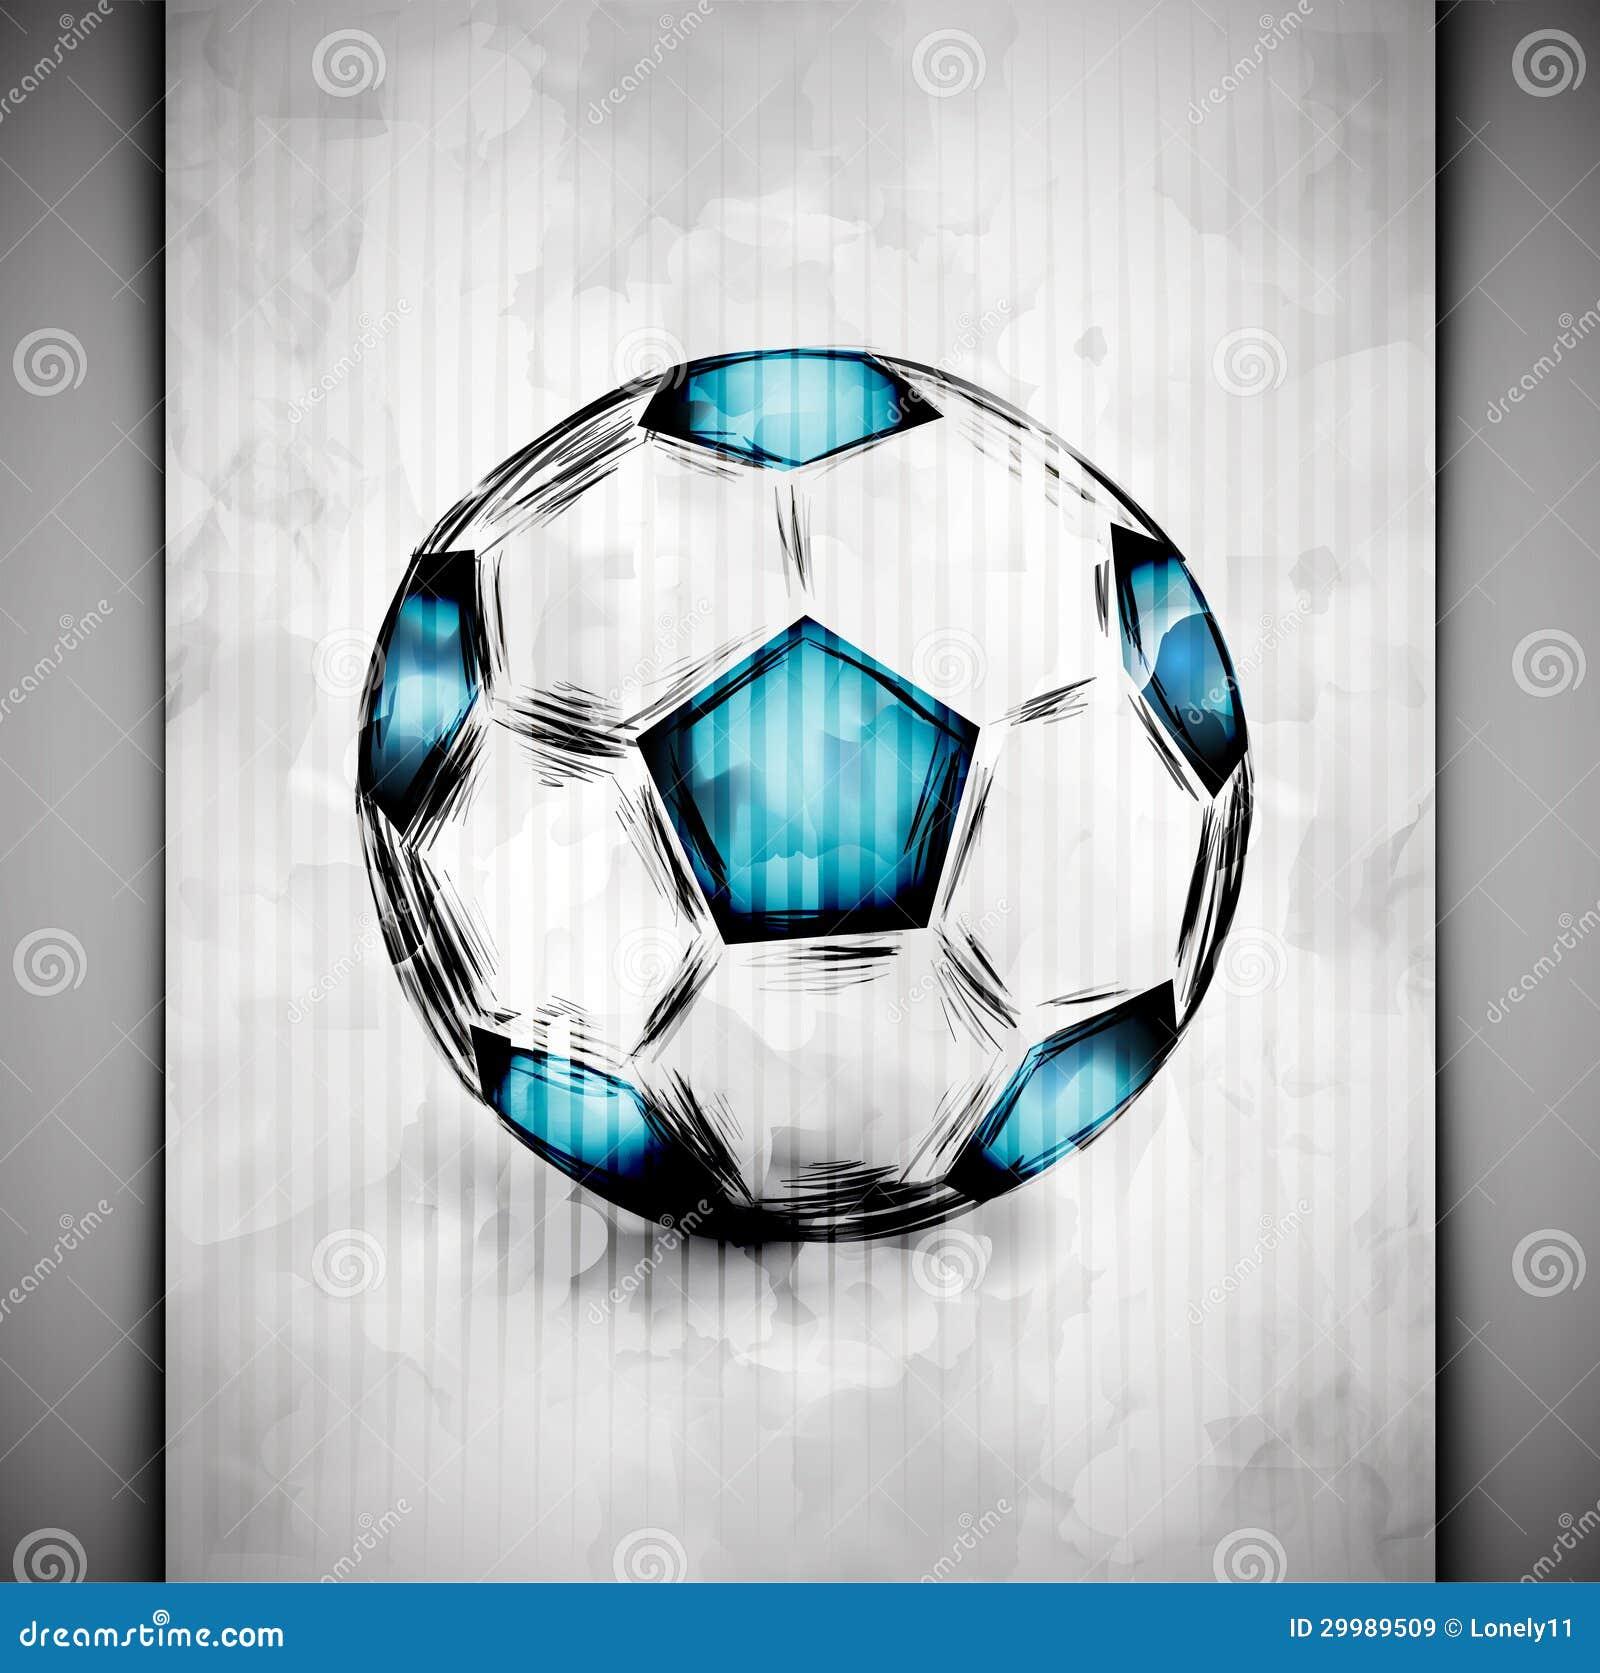 Freestyle football - Wikipedia